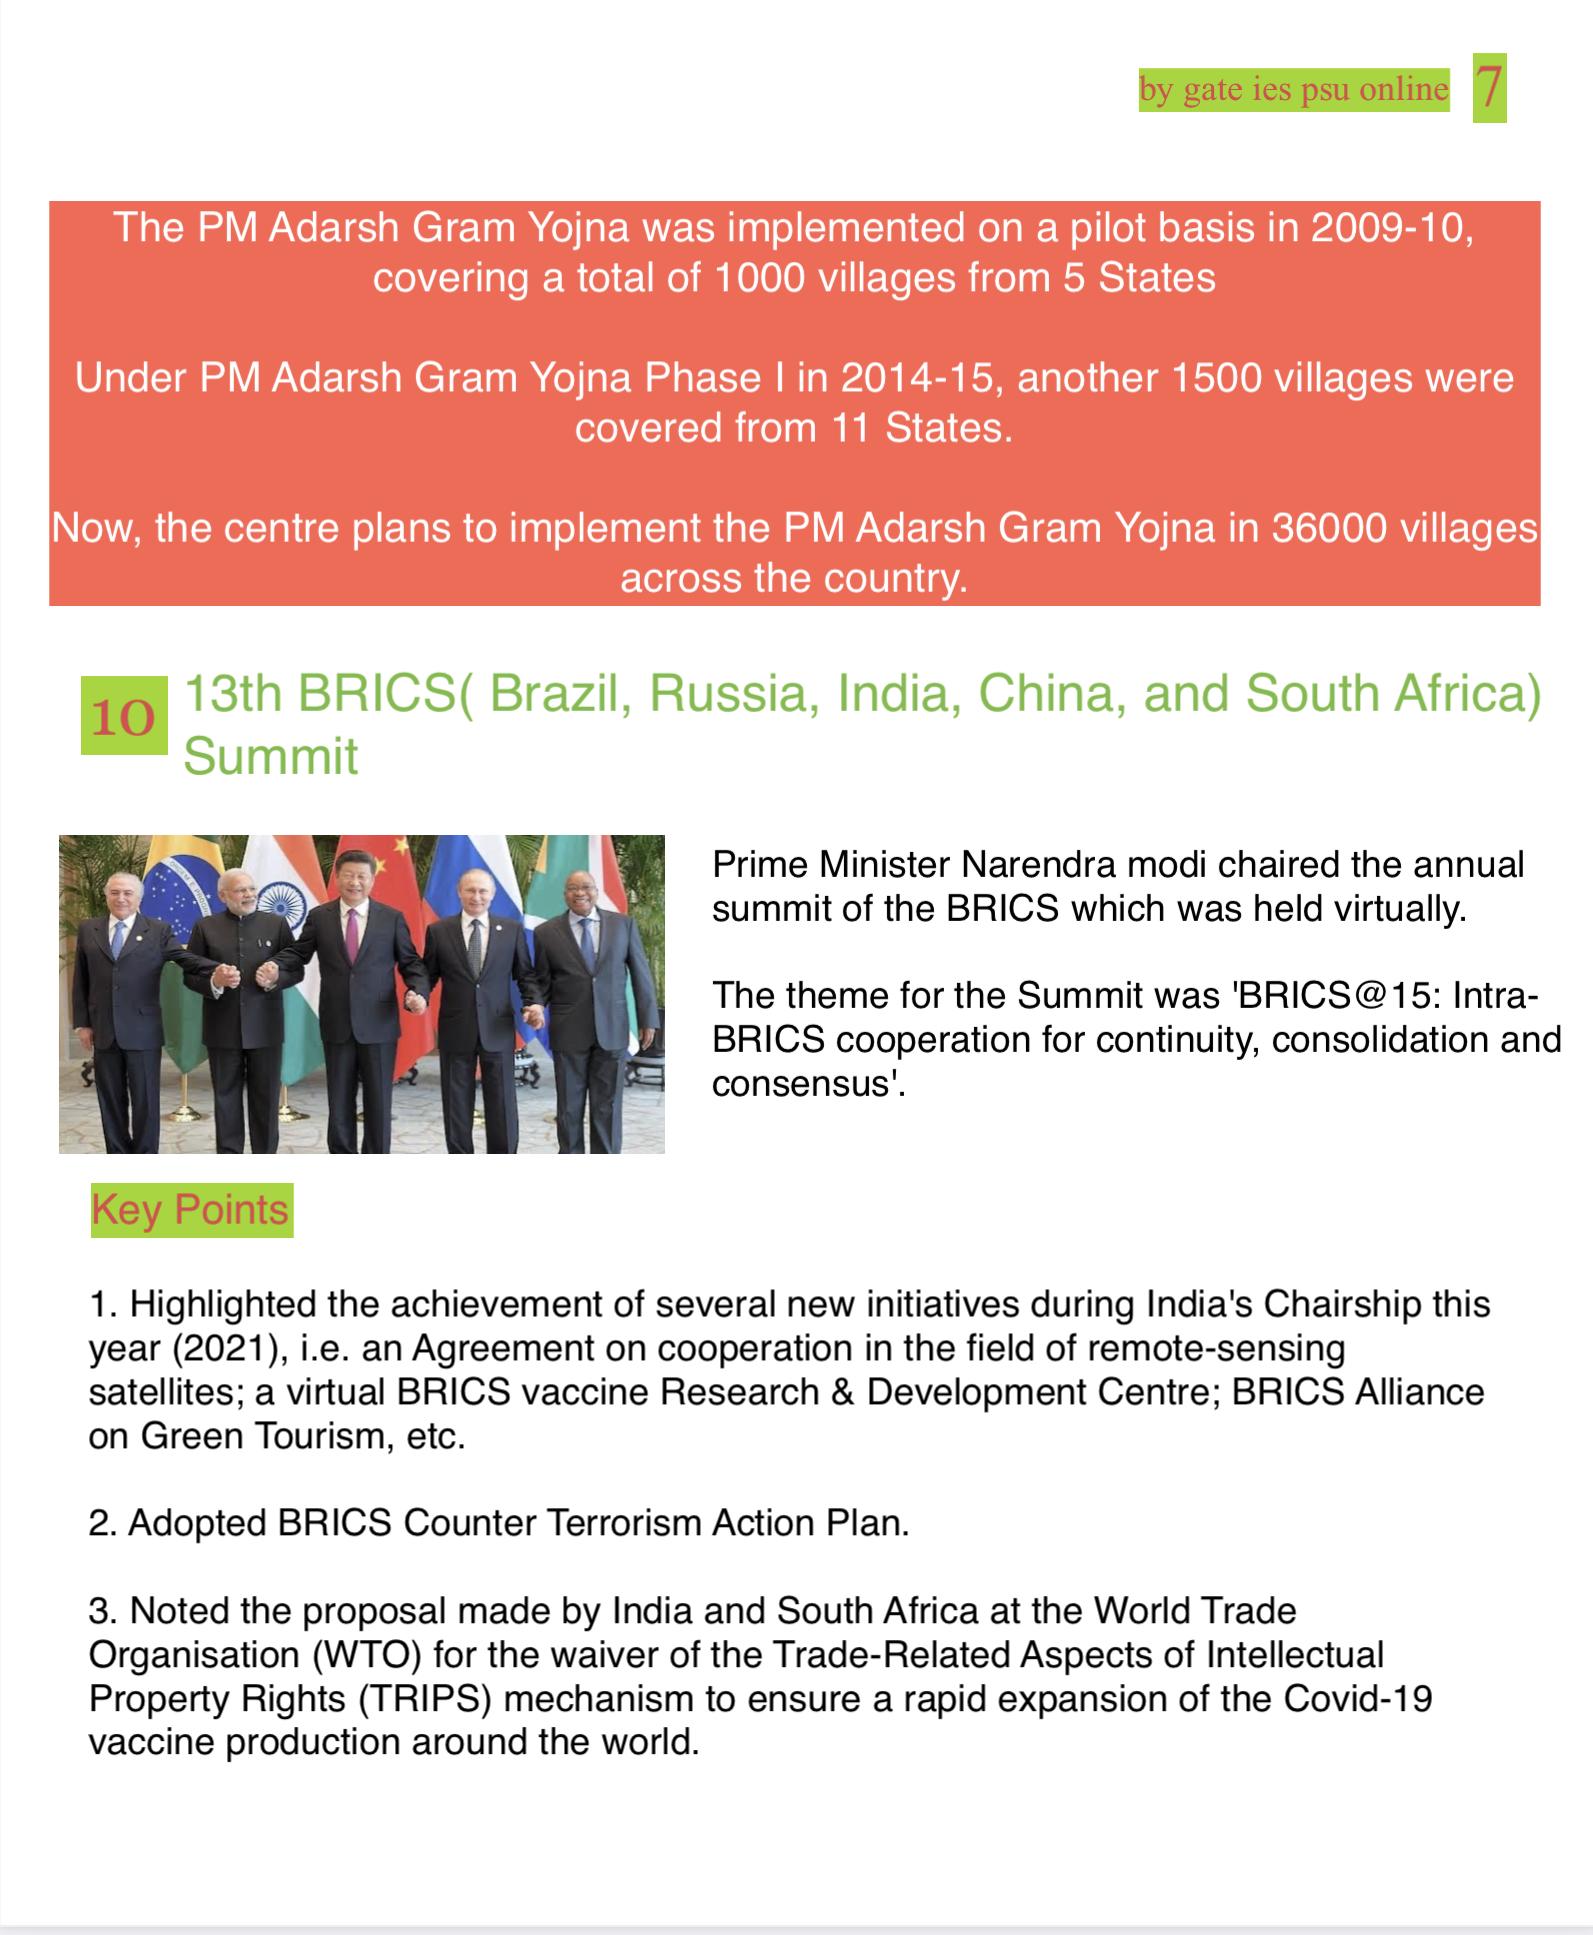 13 BRICS Submit UPSC IES IRMS Current Affairs